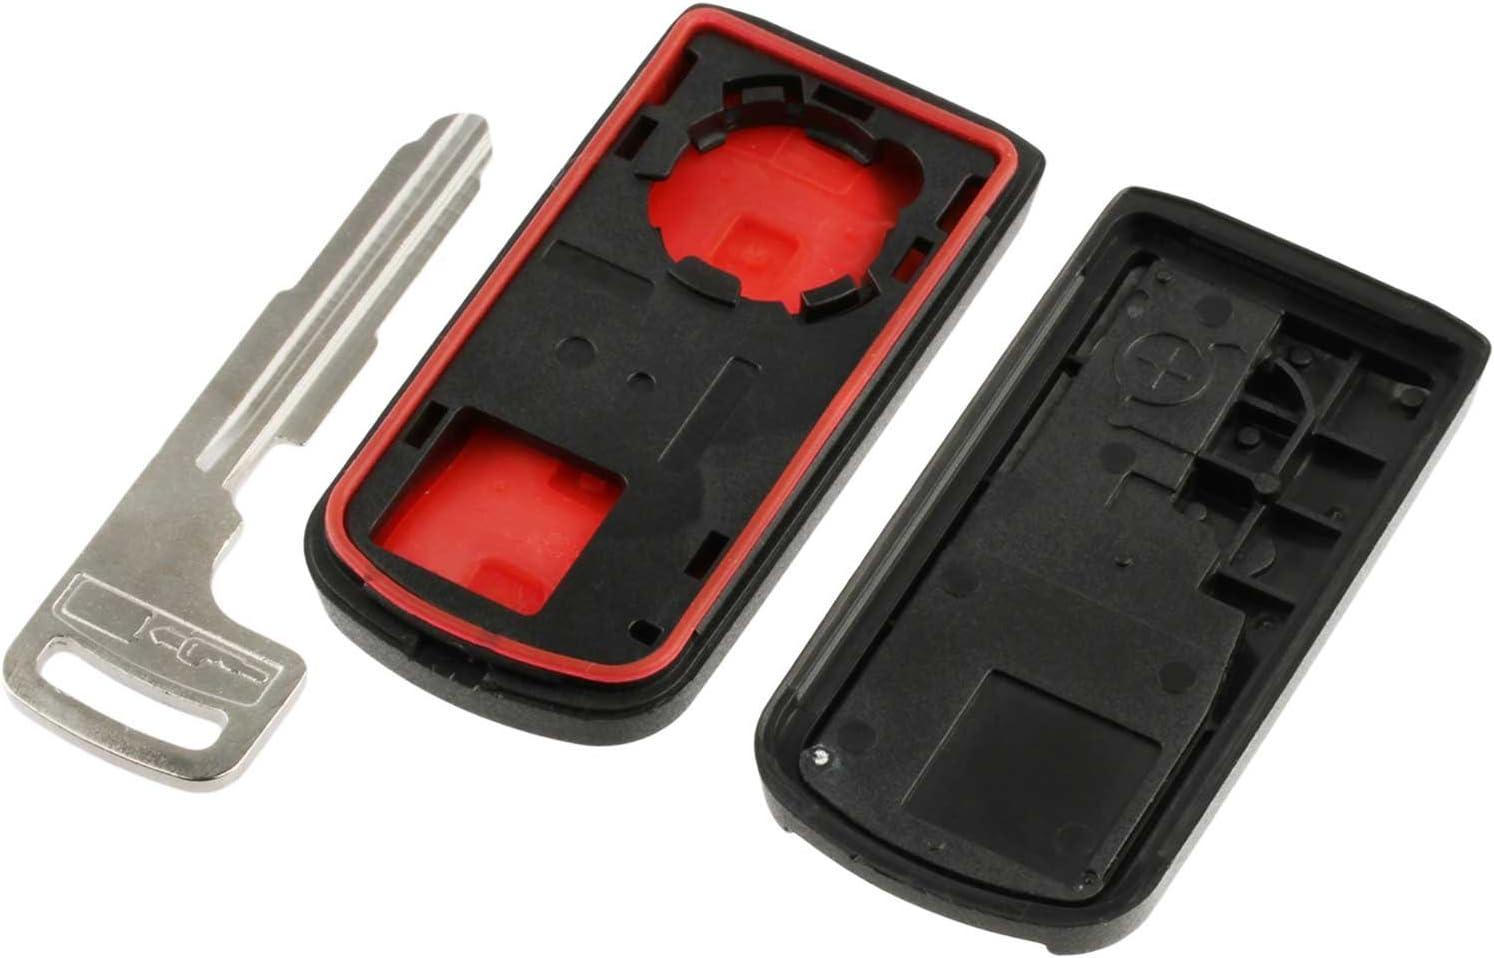 2008-2017 Outlander Key Fob Keyless Entry Smart Remote Shell Case /& Pad fits Mitsubishi 2008-2016 Lancer